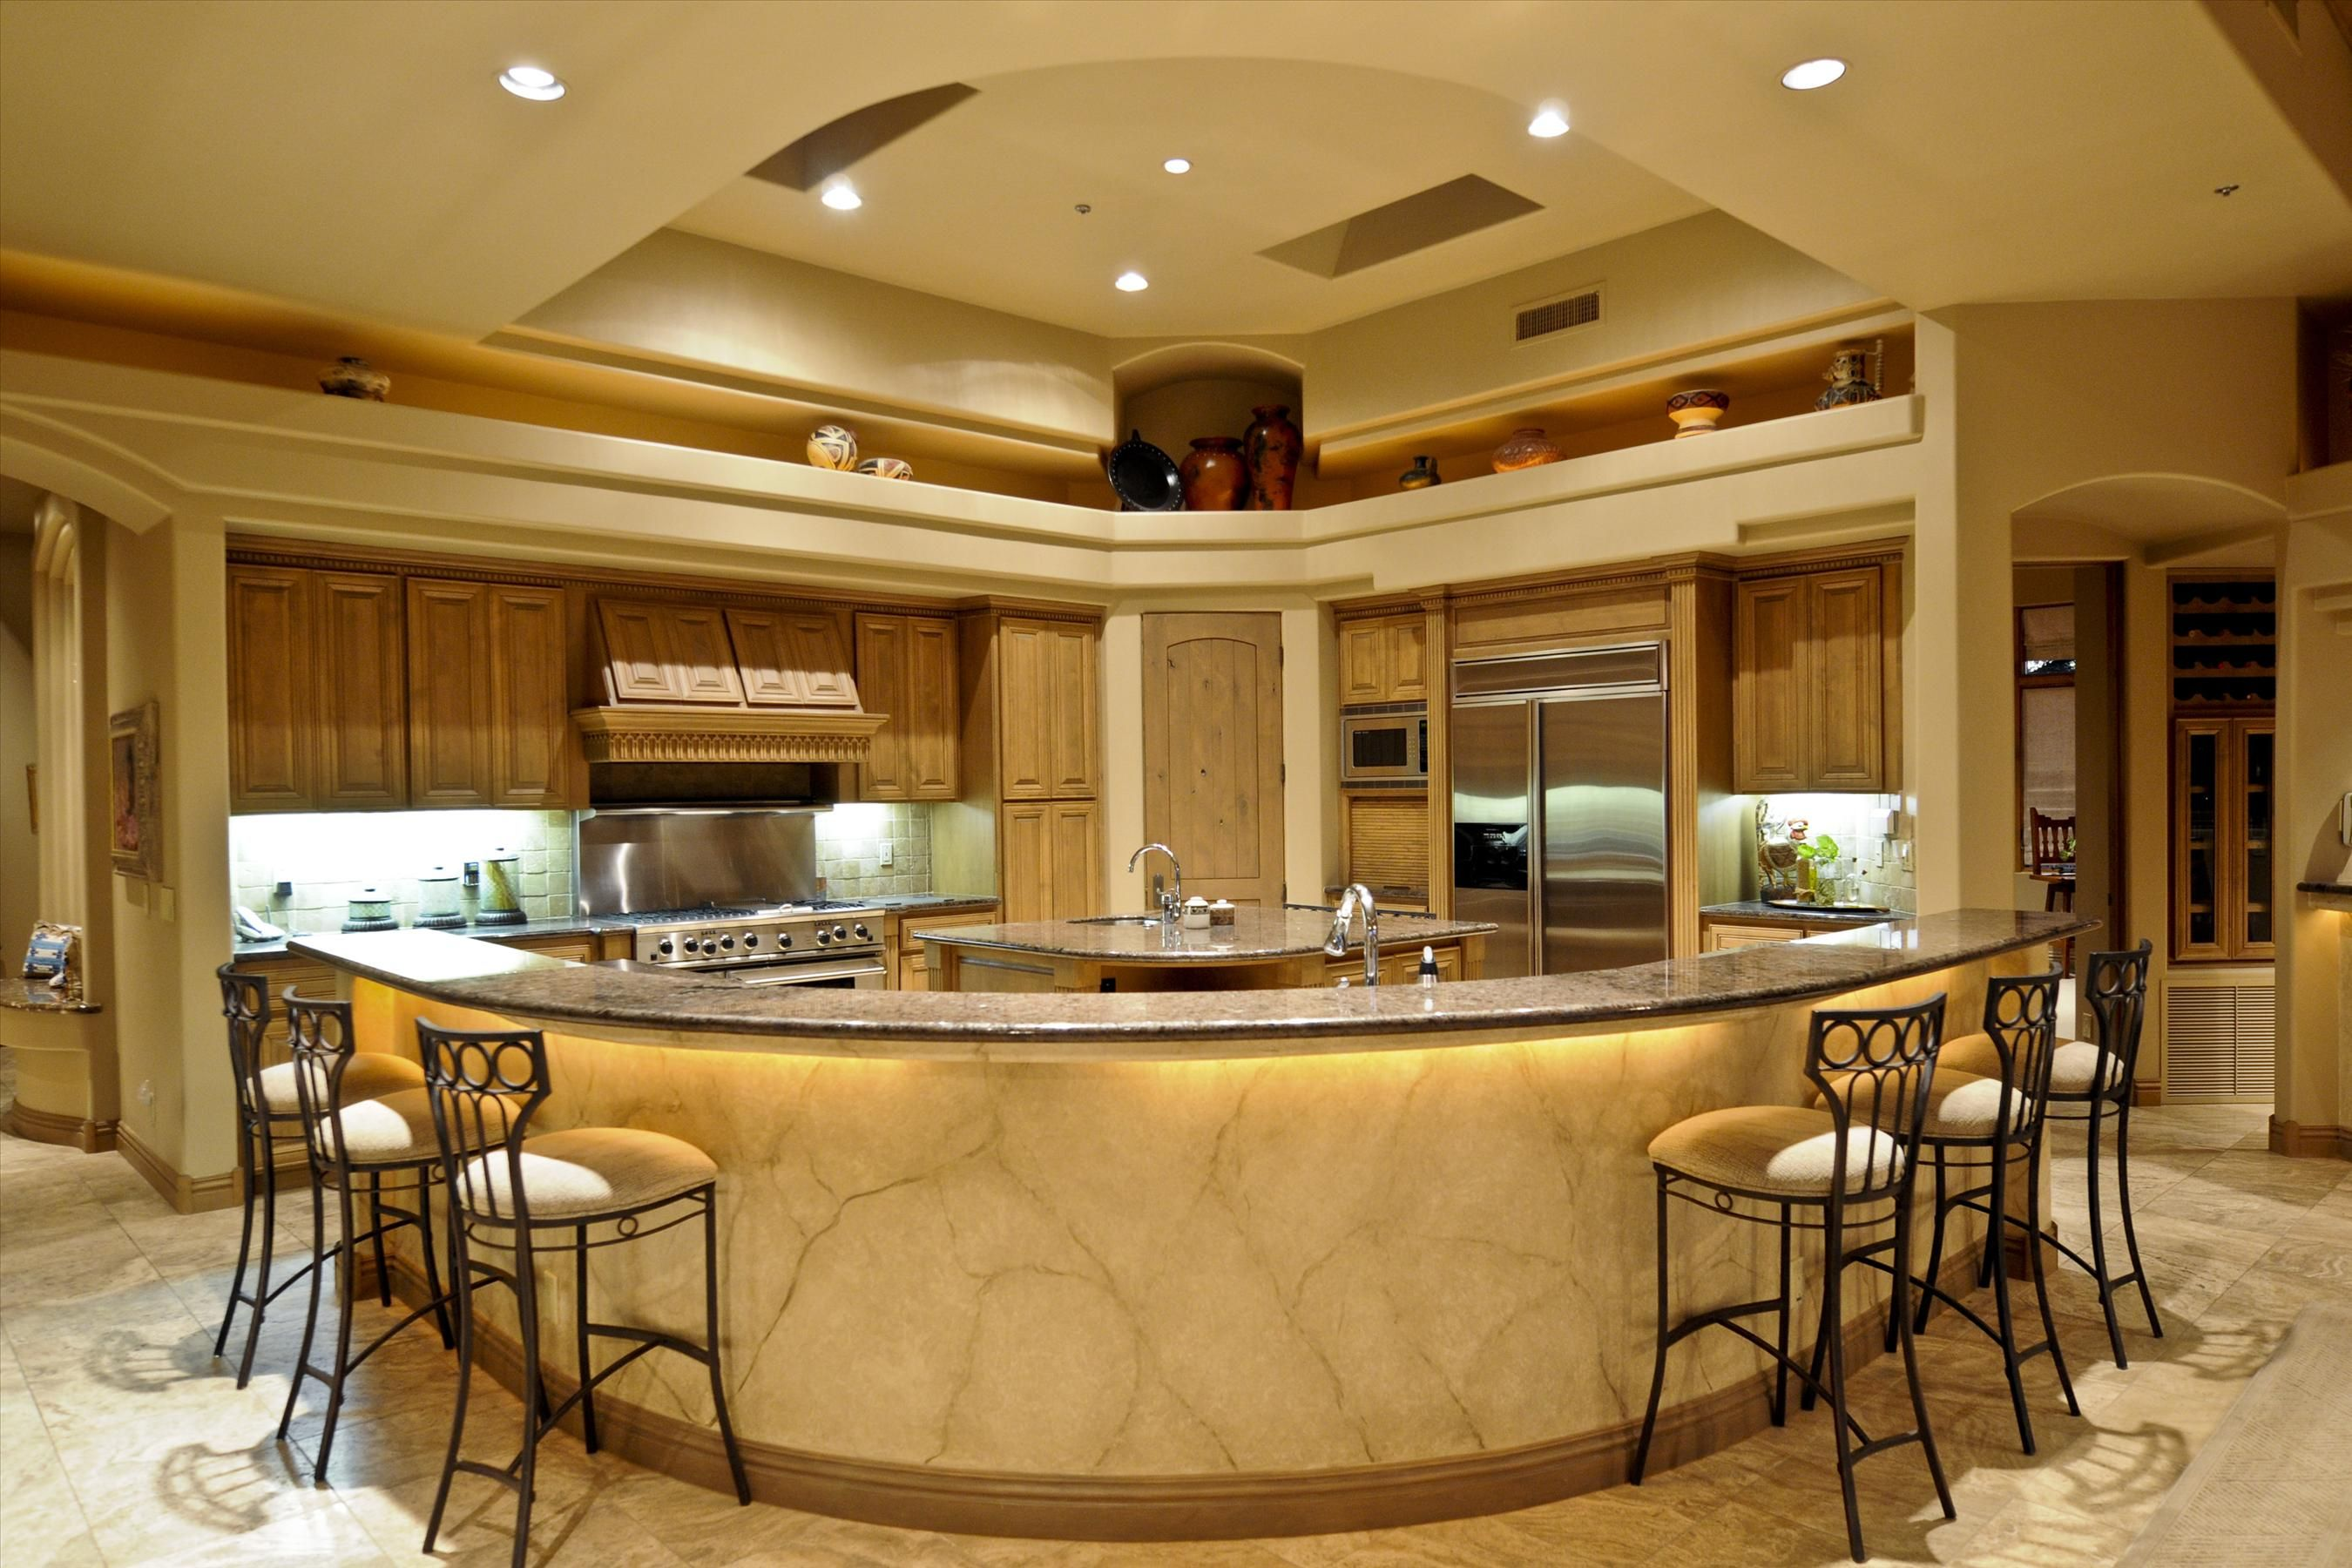 mansion kitchens luxury mansions kitchen www galleryhip com the hippest pics house on kitchen interior luxury id=68457